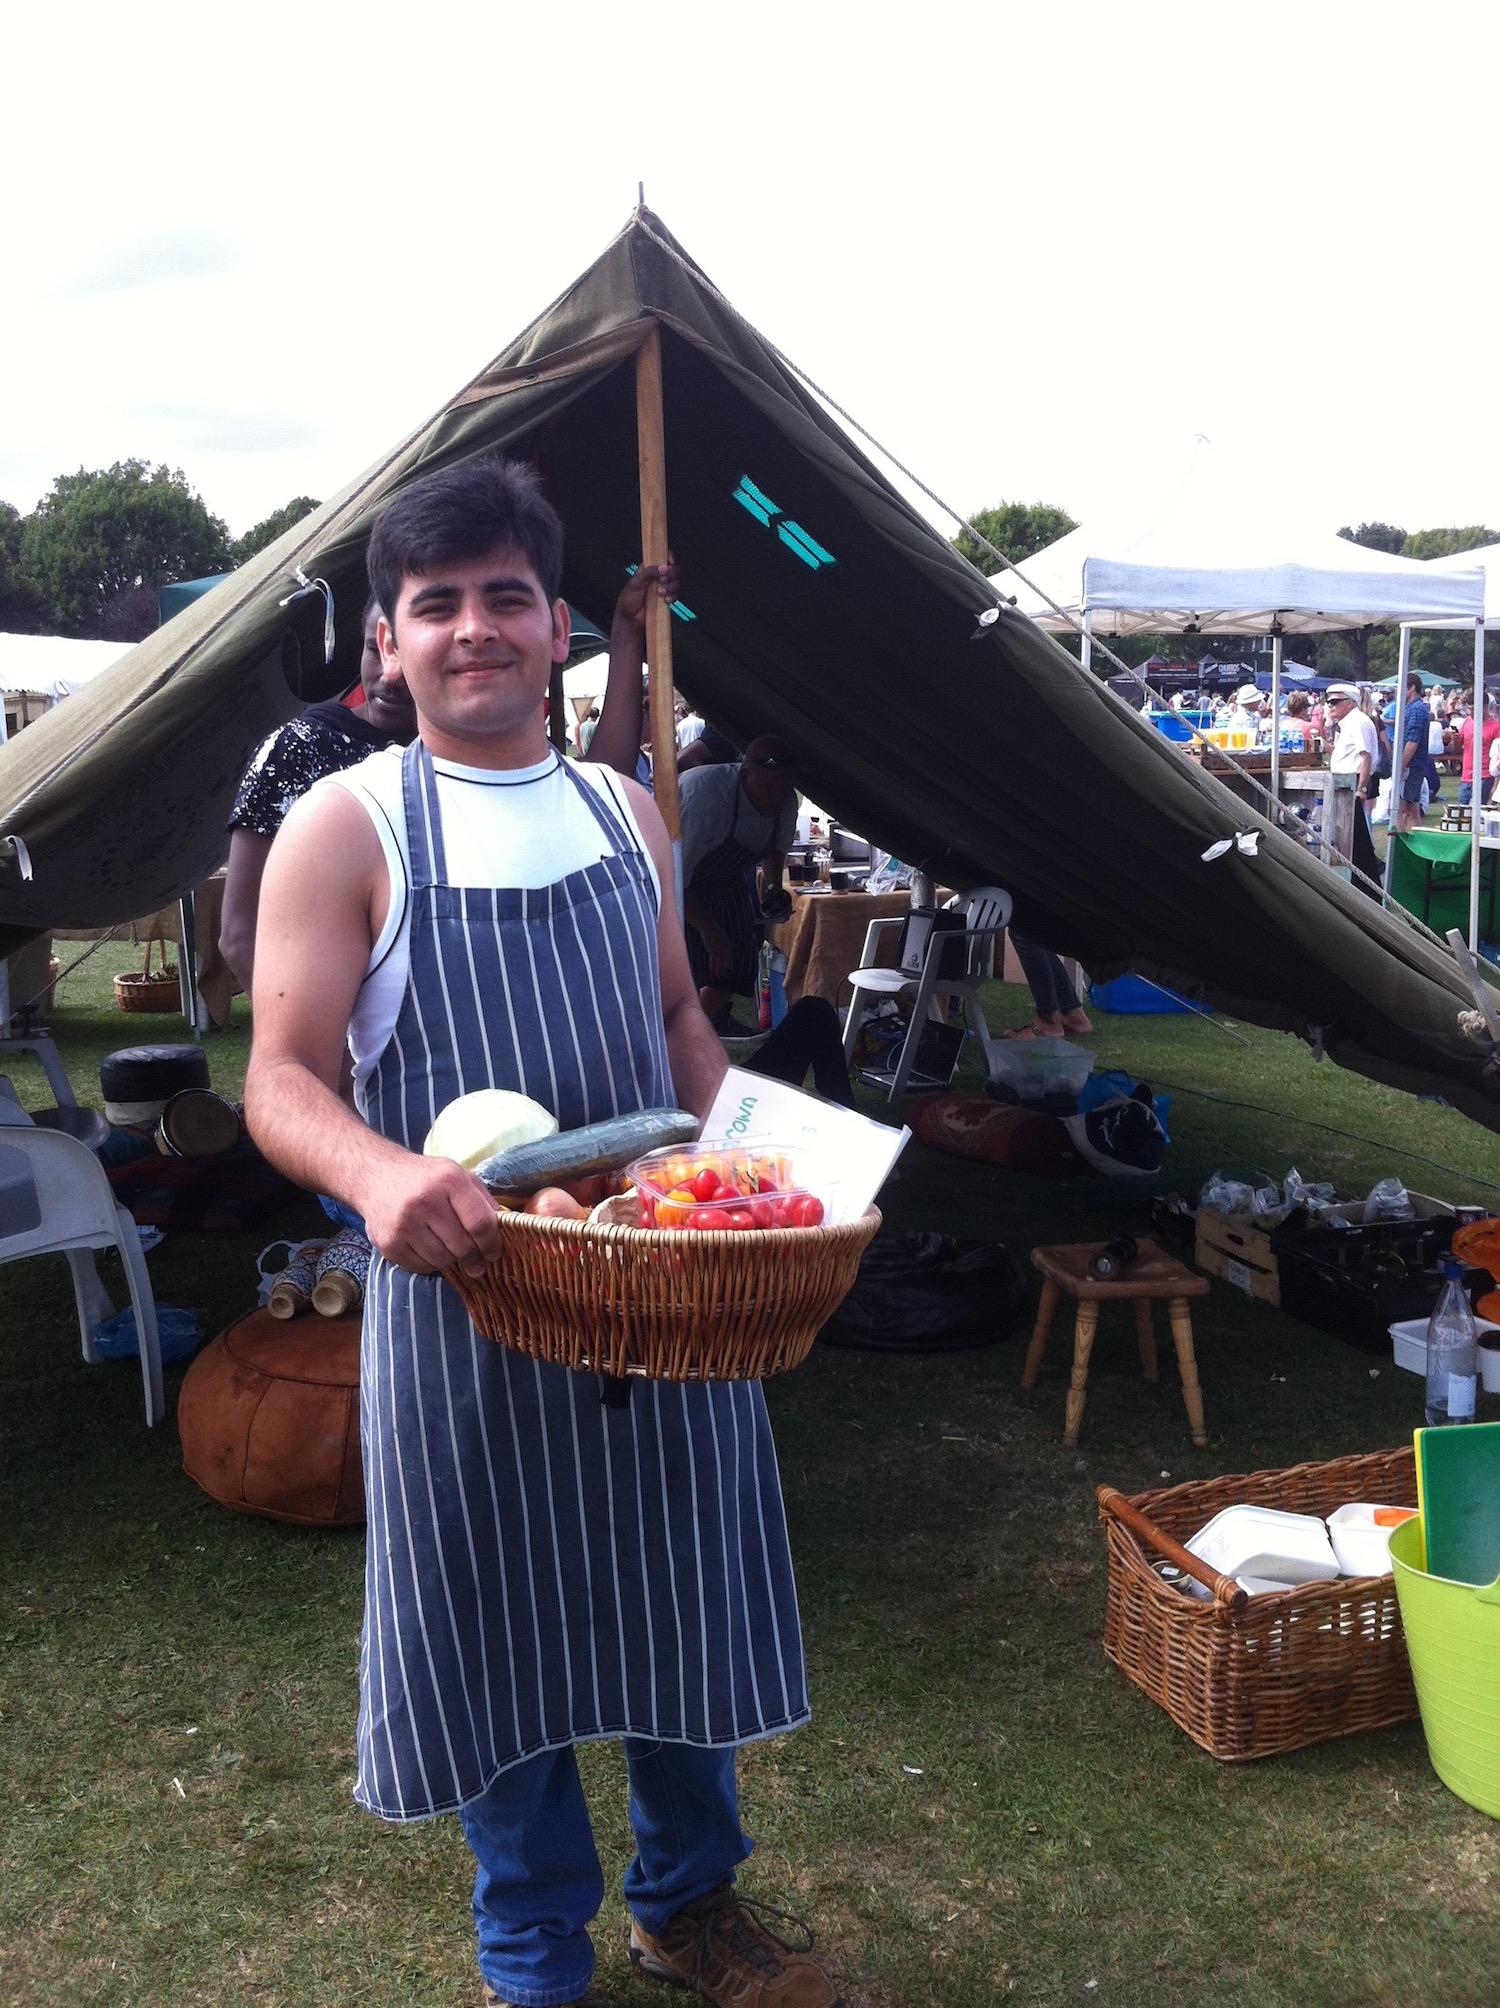 2016-kran-the-welcome-tent-salad-hythe-food-festival.jpg